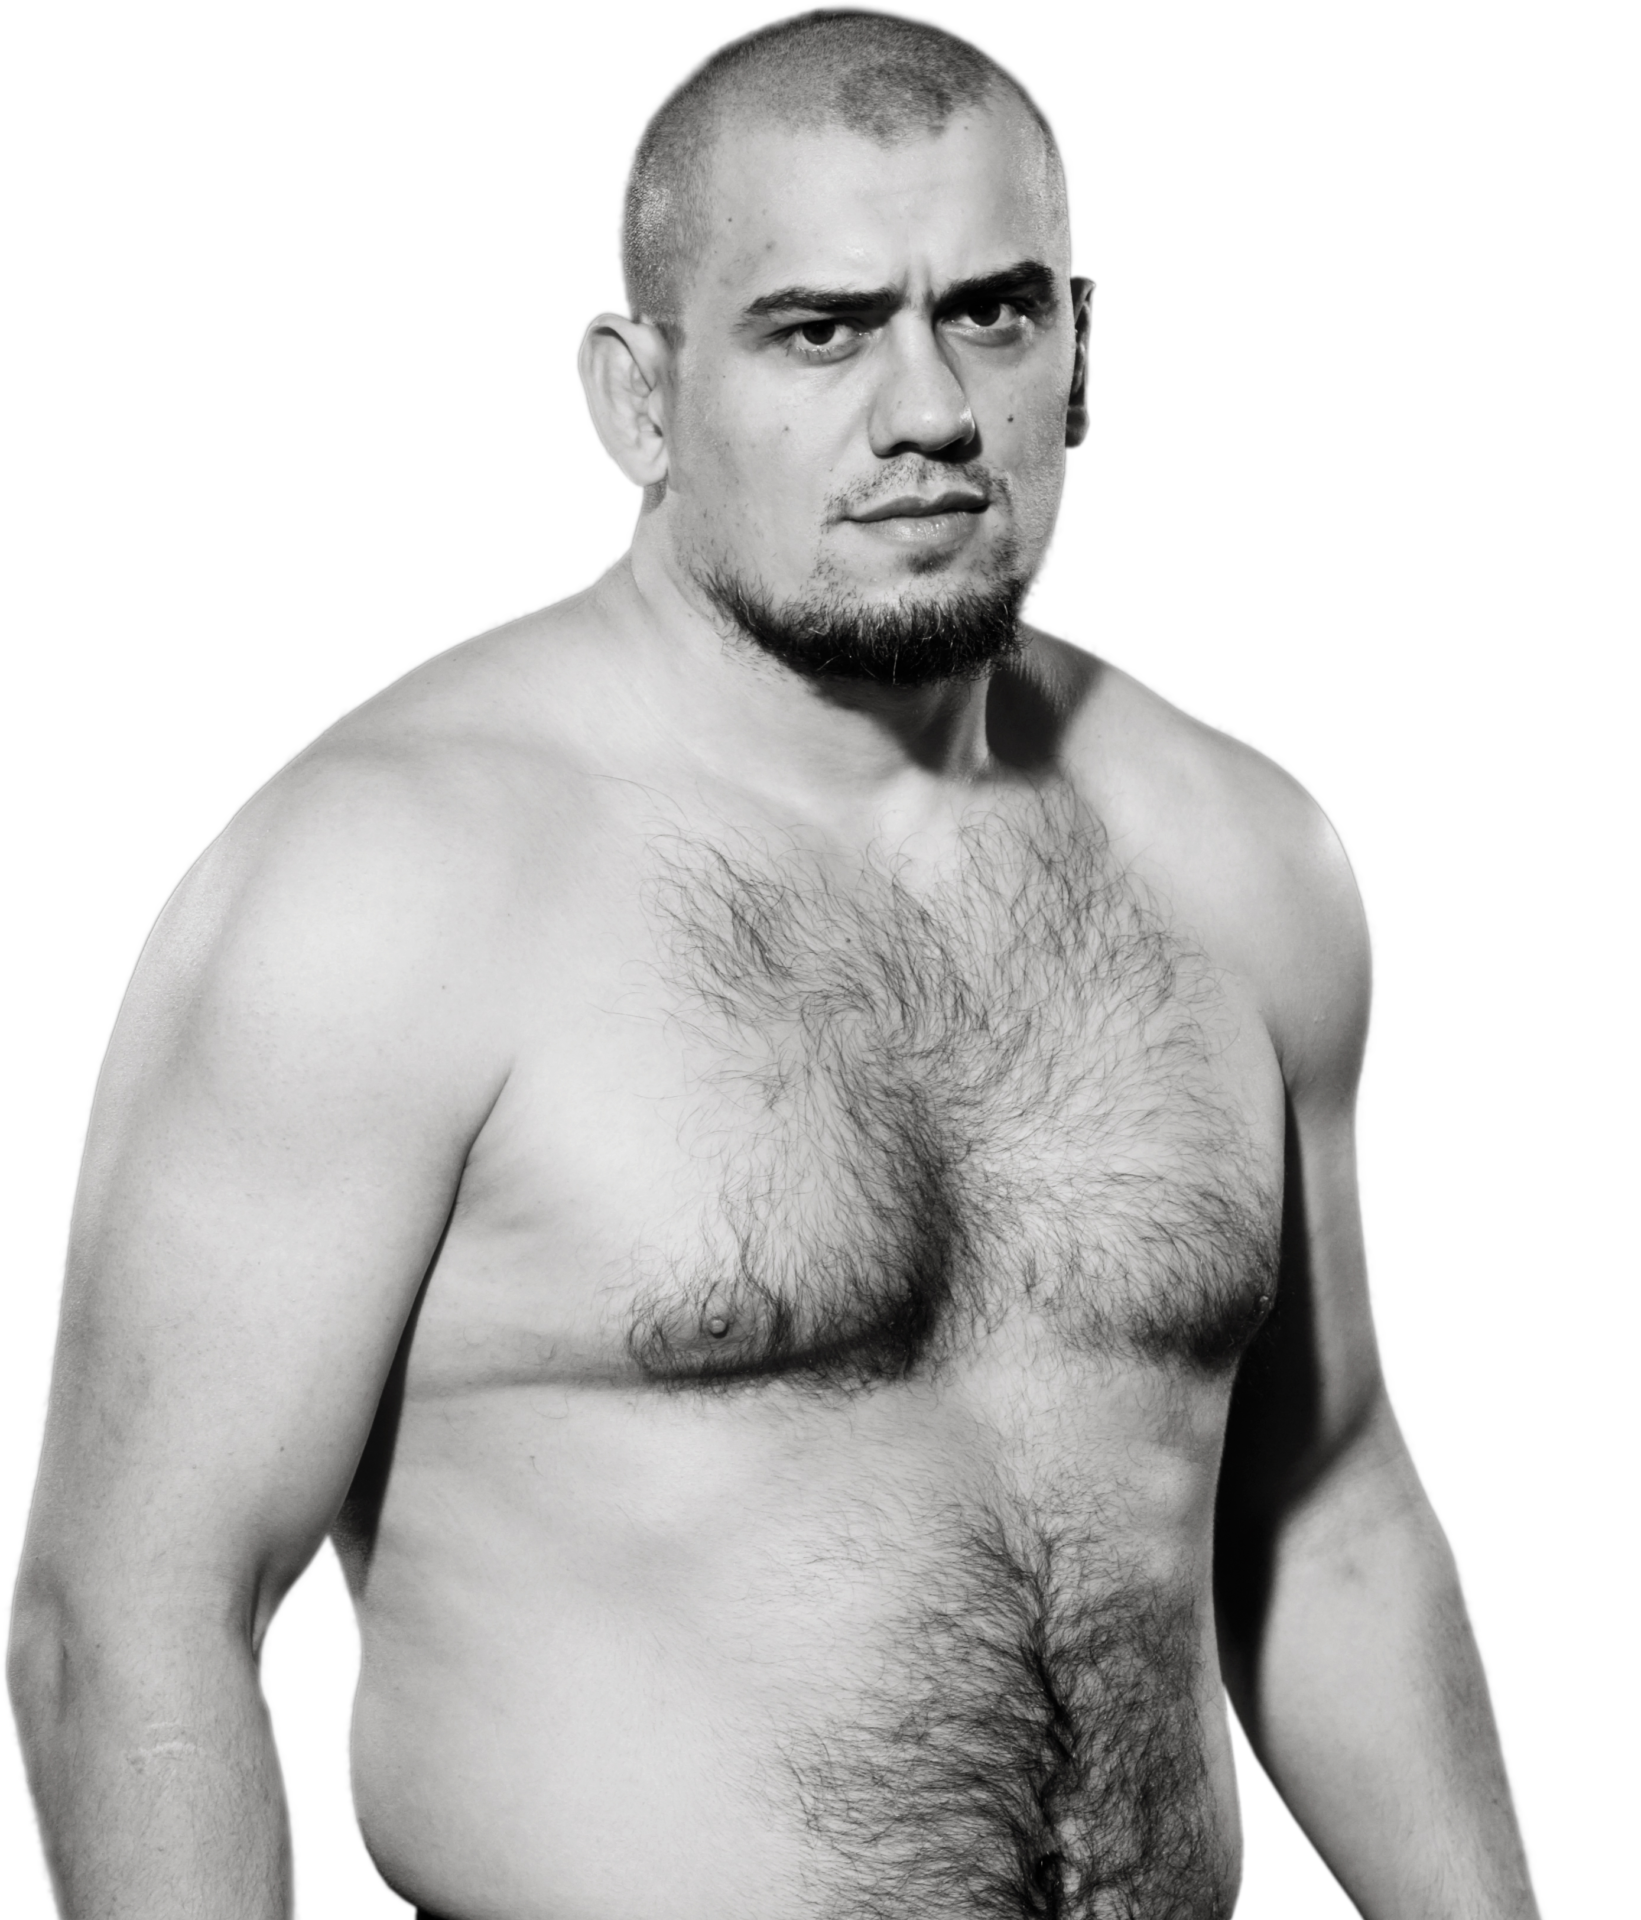 Marat Aliaskhabov